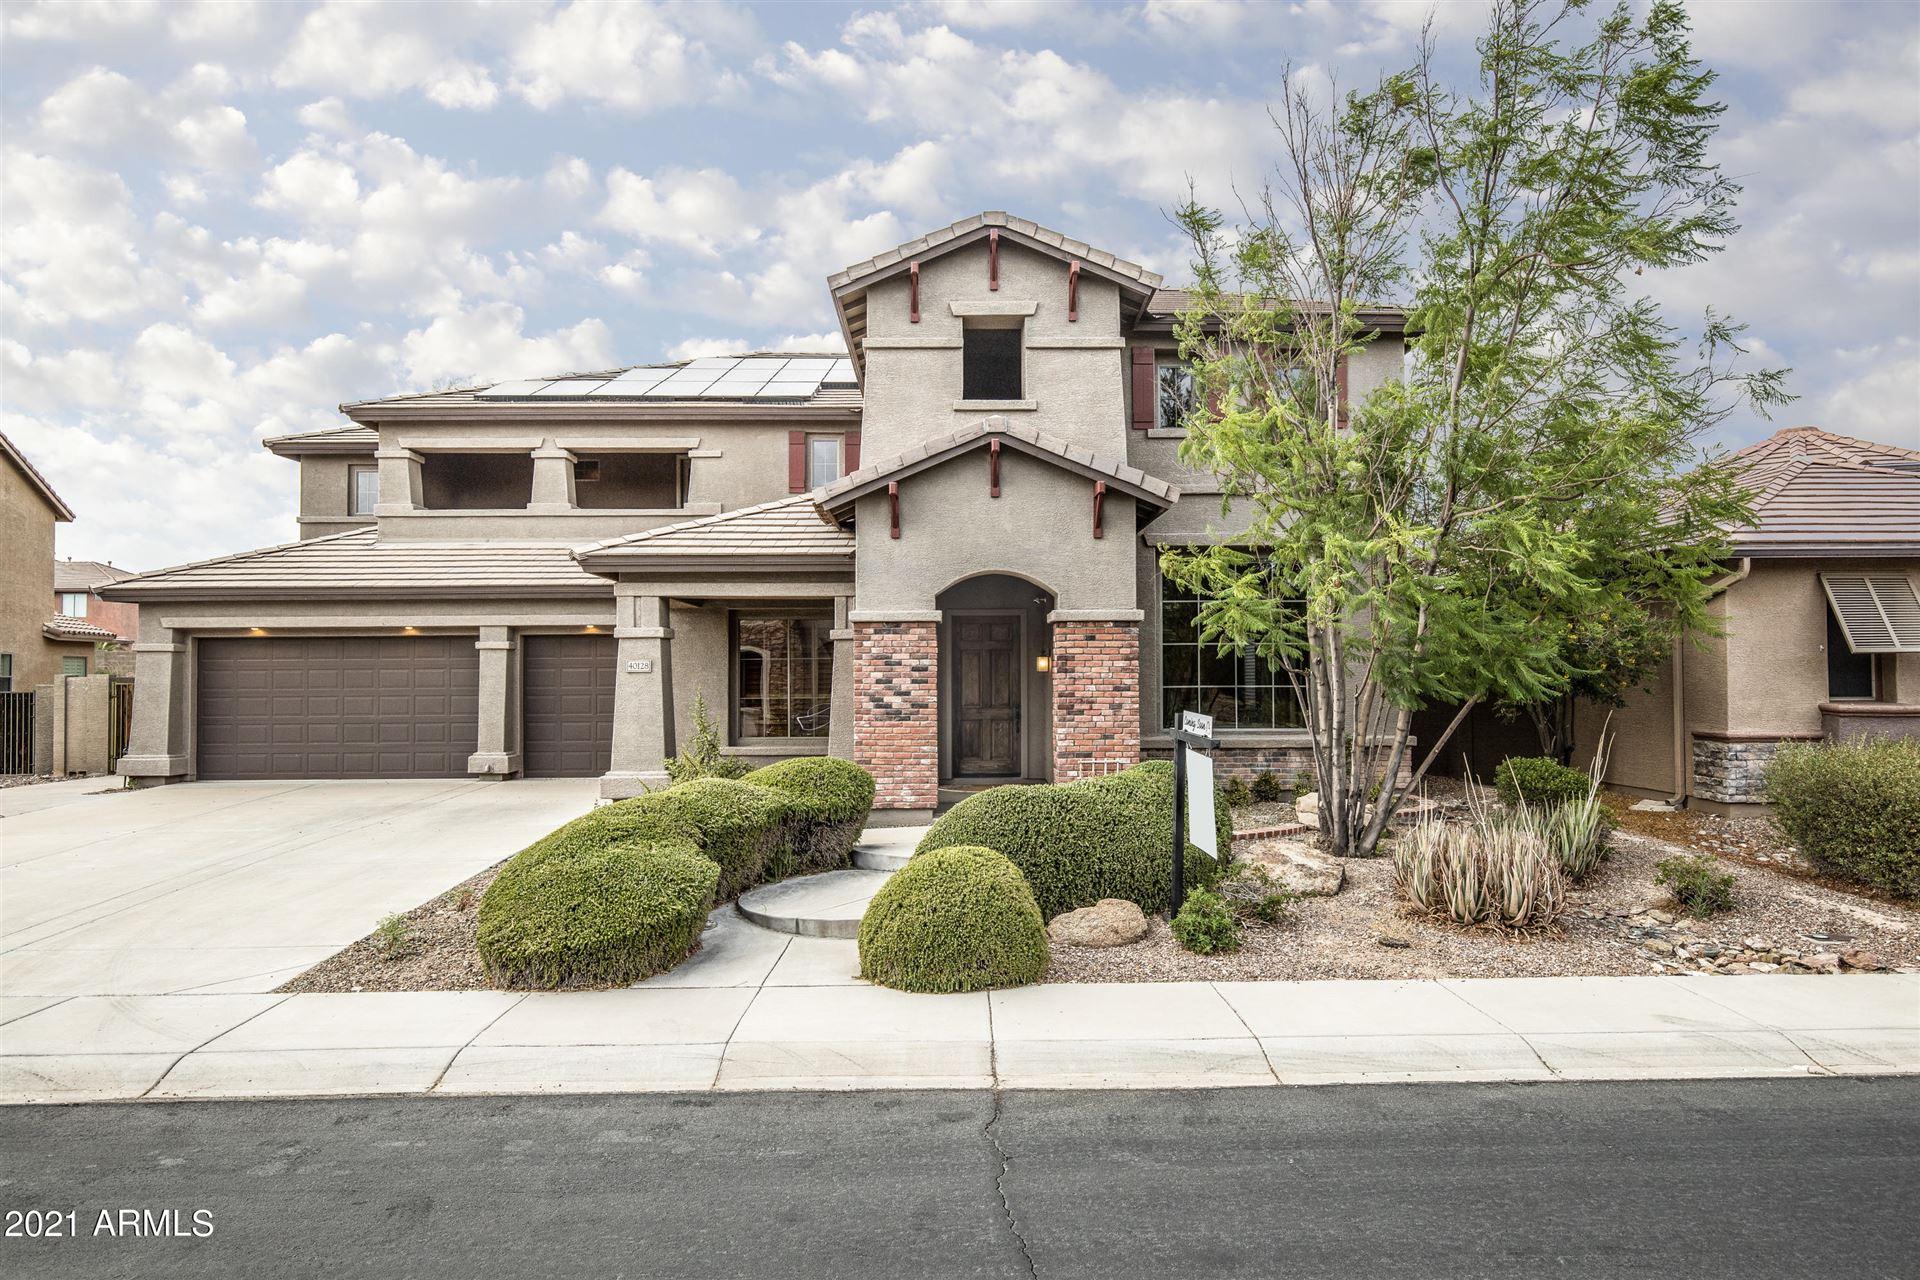 40128 N HICKOK Trail, Phoenix, AZ 85086 - MLS#: 6261312